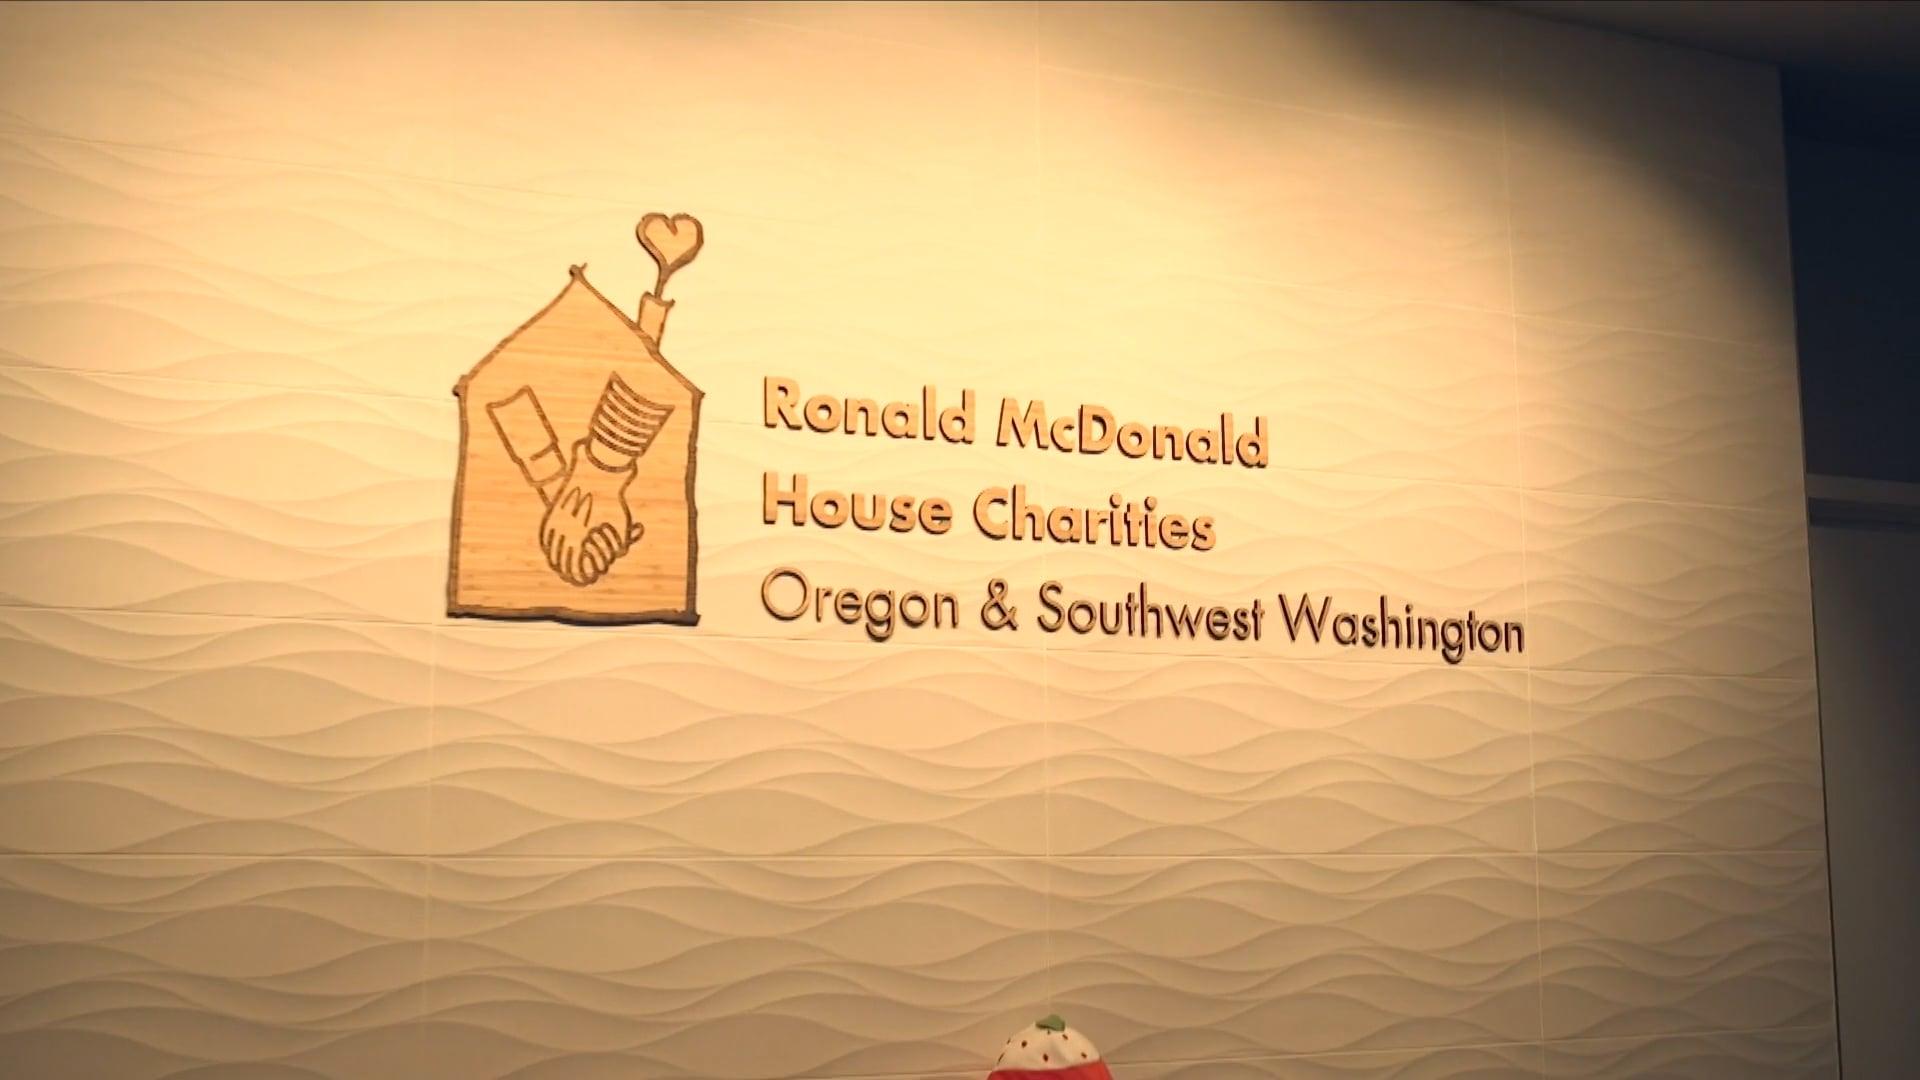 Ronald McDonald House Portland Trailblazers McDonalds Shamrock Shake Promo, Ryan Ao Media Portland Production Company